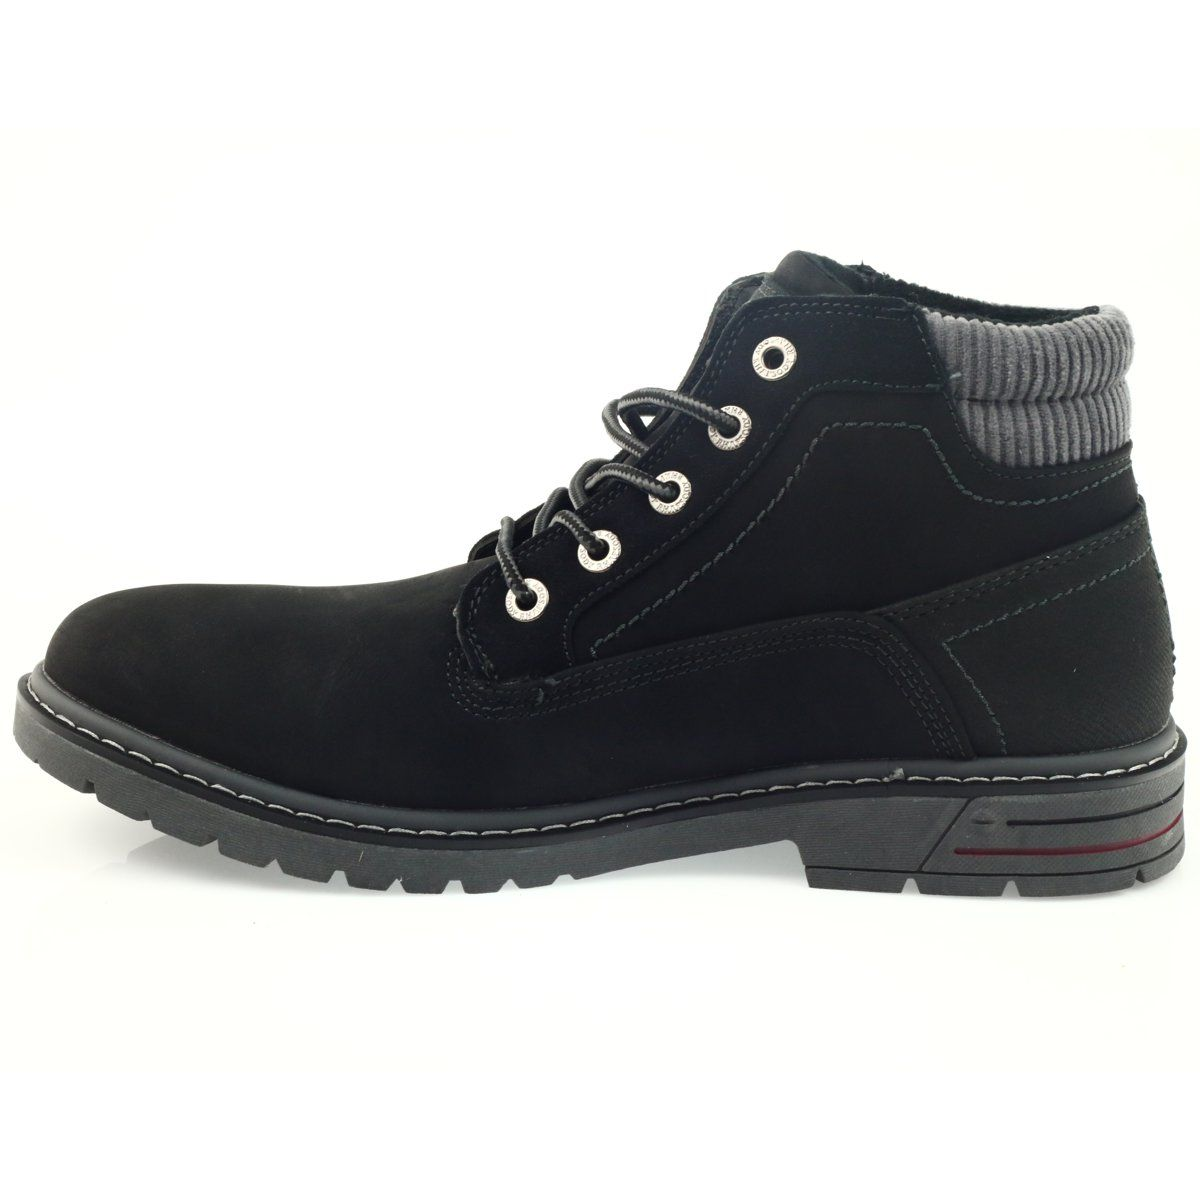 American Club American Trapery Buty Zimowe Trekkingi Czarne Club Shoes Trekking Shoes Comfortable Shoes